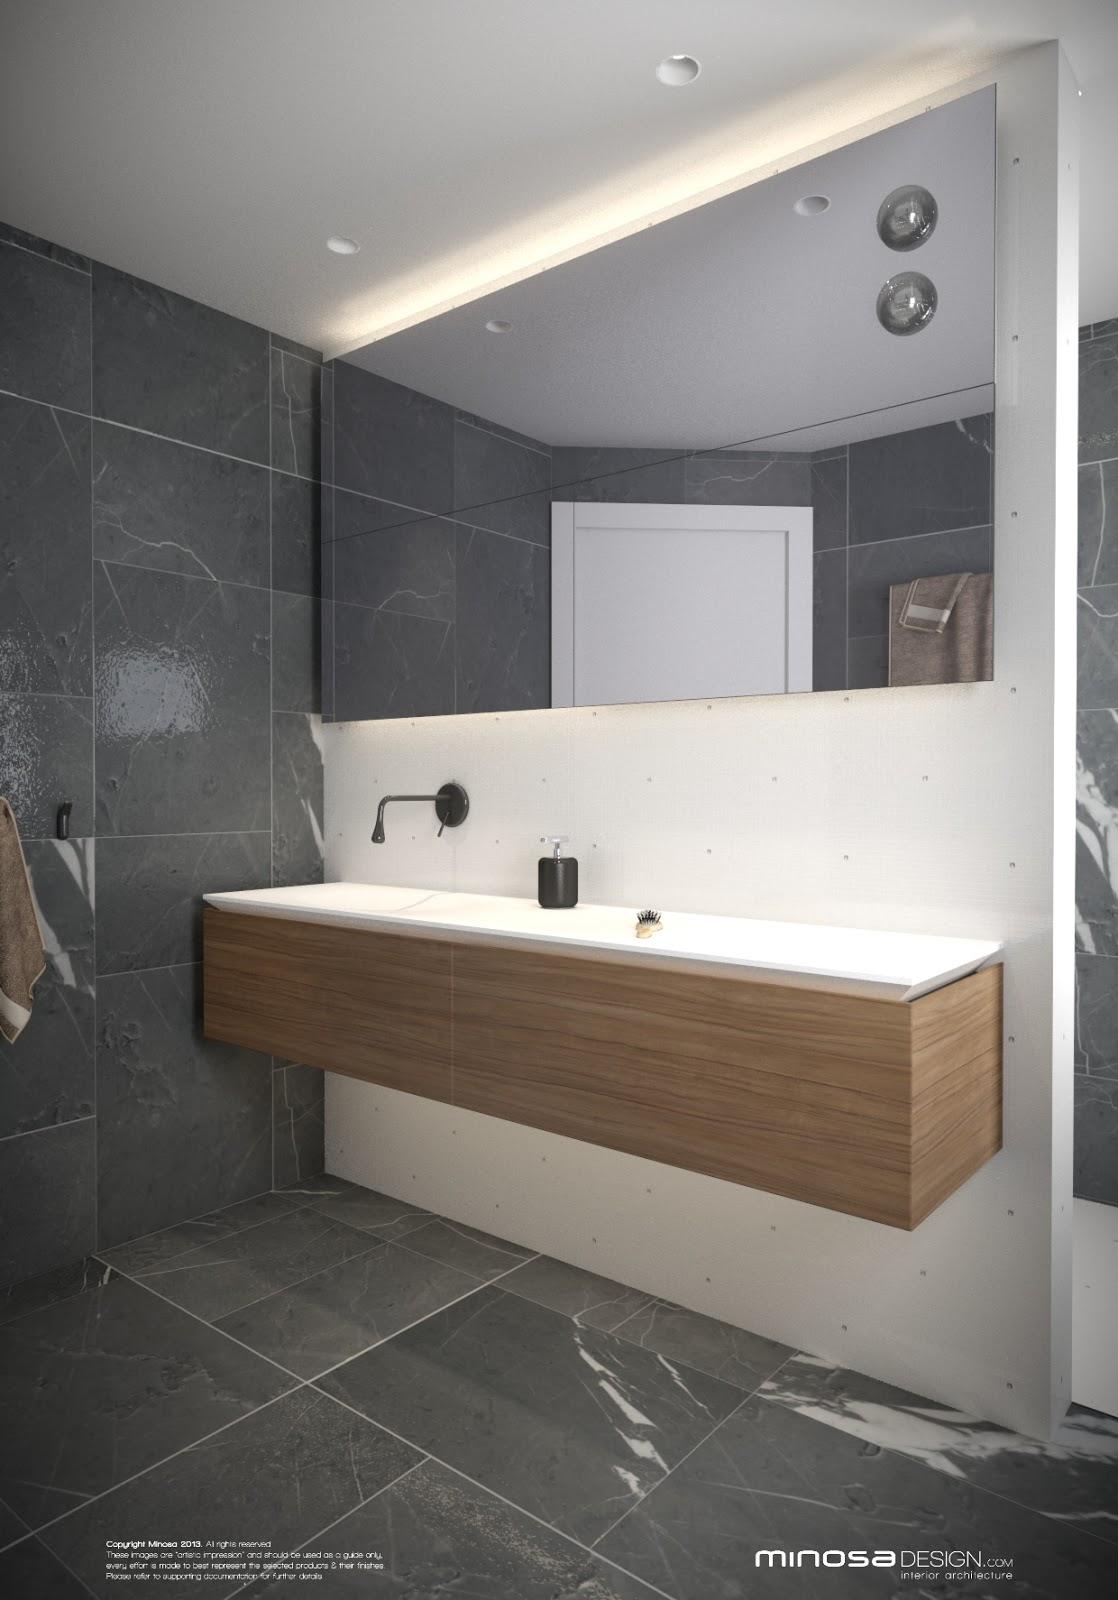 Modern Bathroom With Same Tile On Floor And Wall Main: Minosa: Small Modern Bathroom To Share